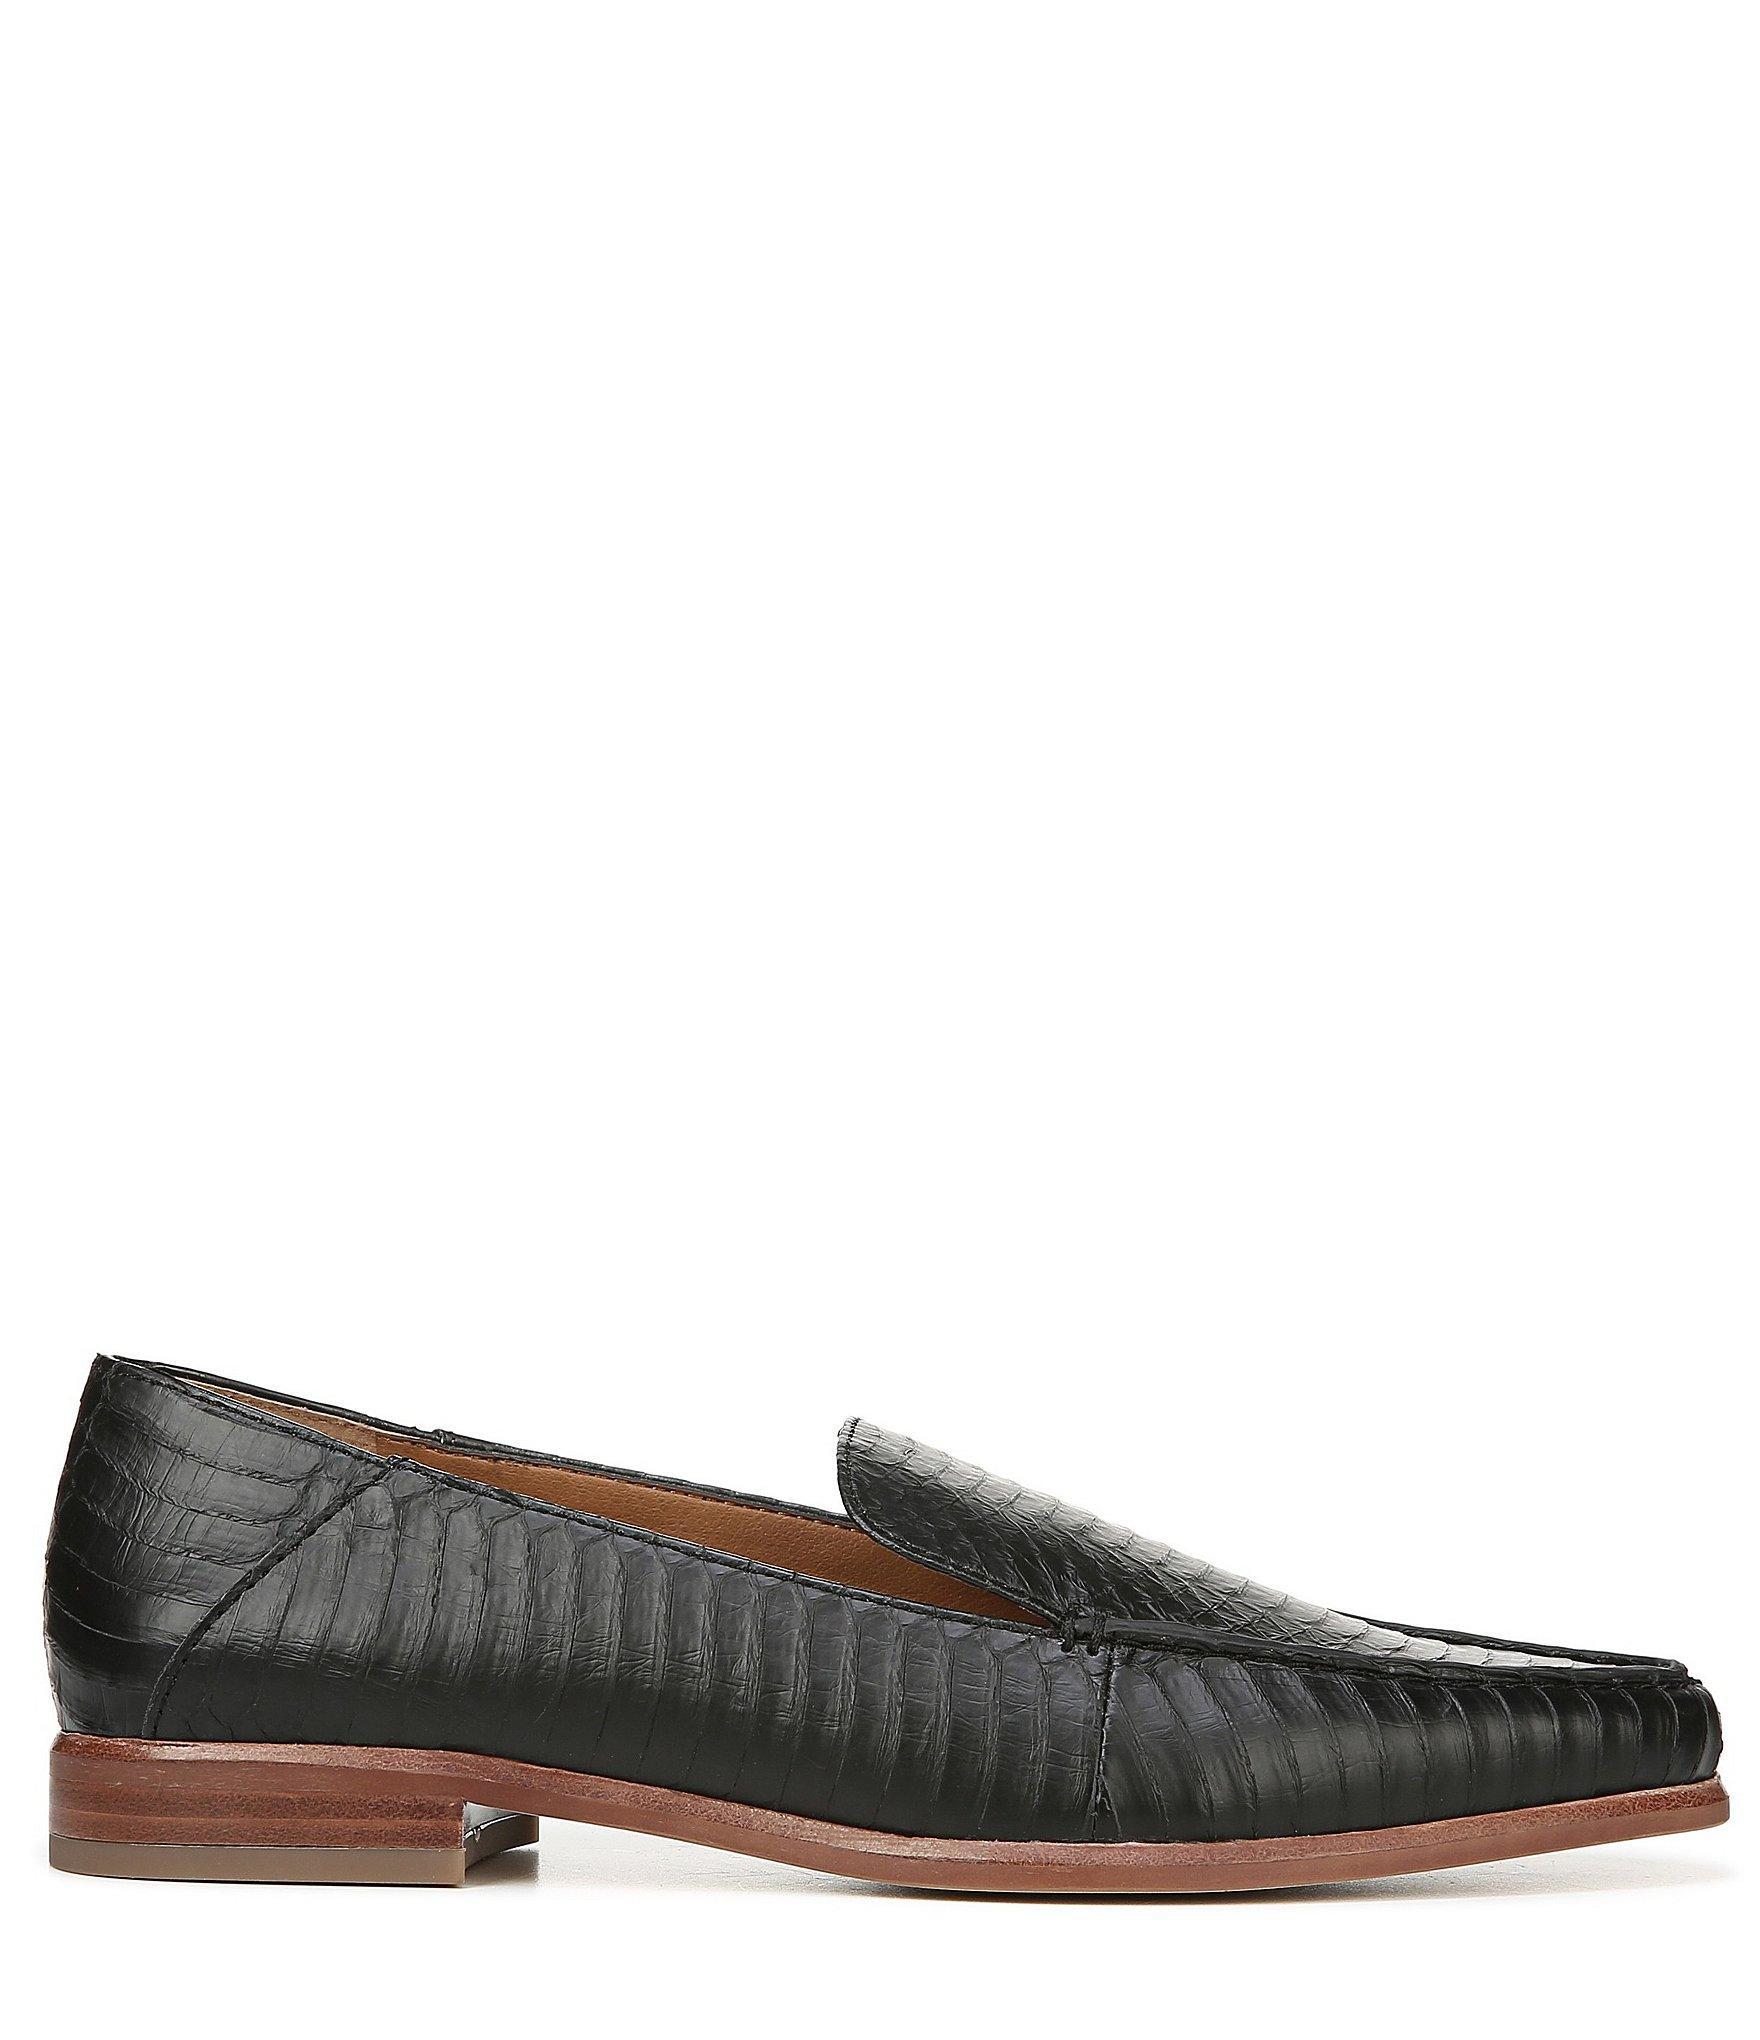 e6ec071103b Franco Sarto - Black Sarto By Portia 3 Leather Block Heel Loafers - Lyst.  View fullscreen